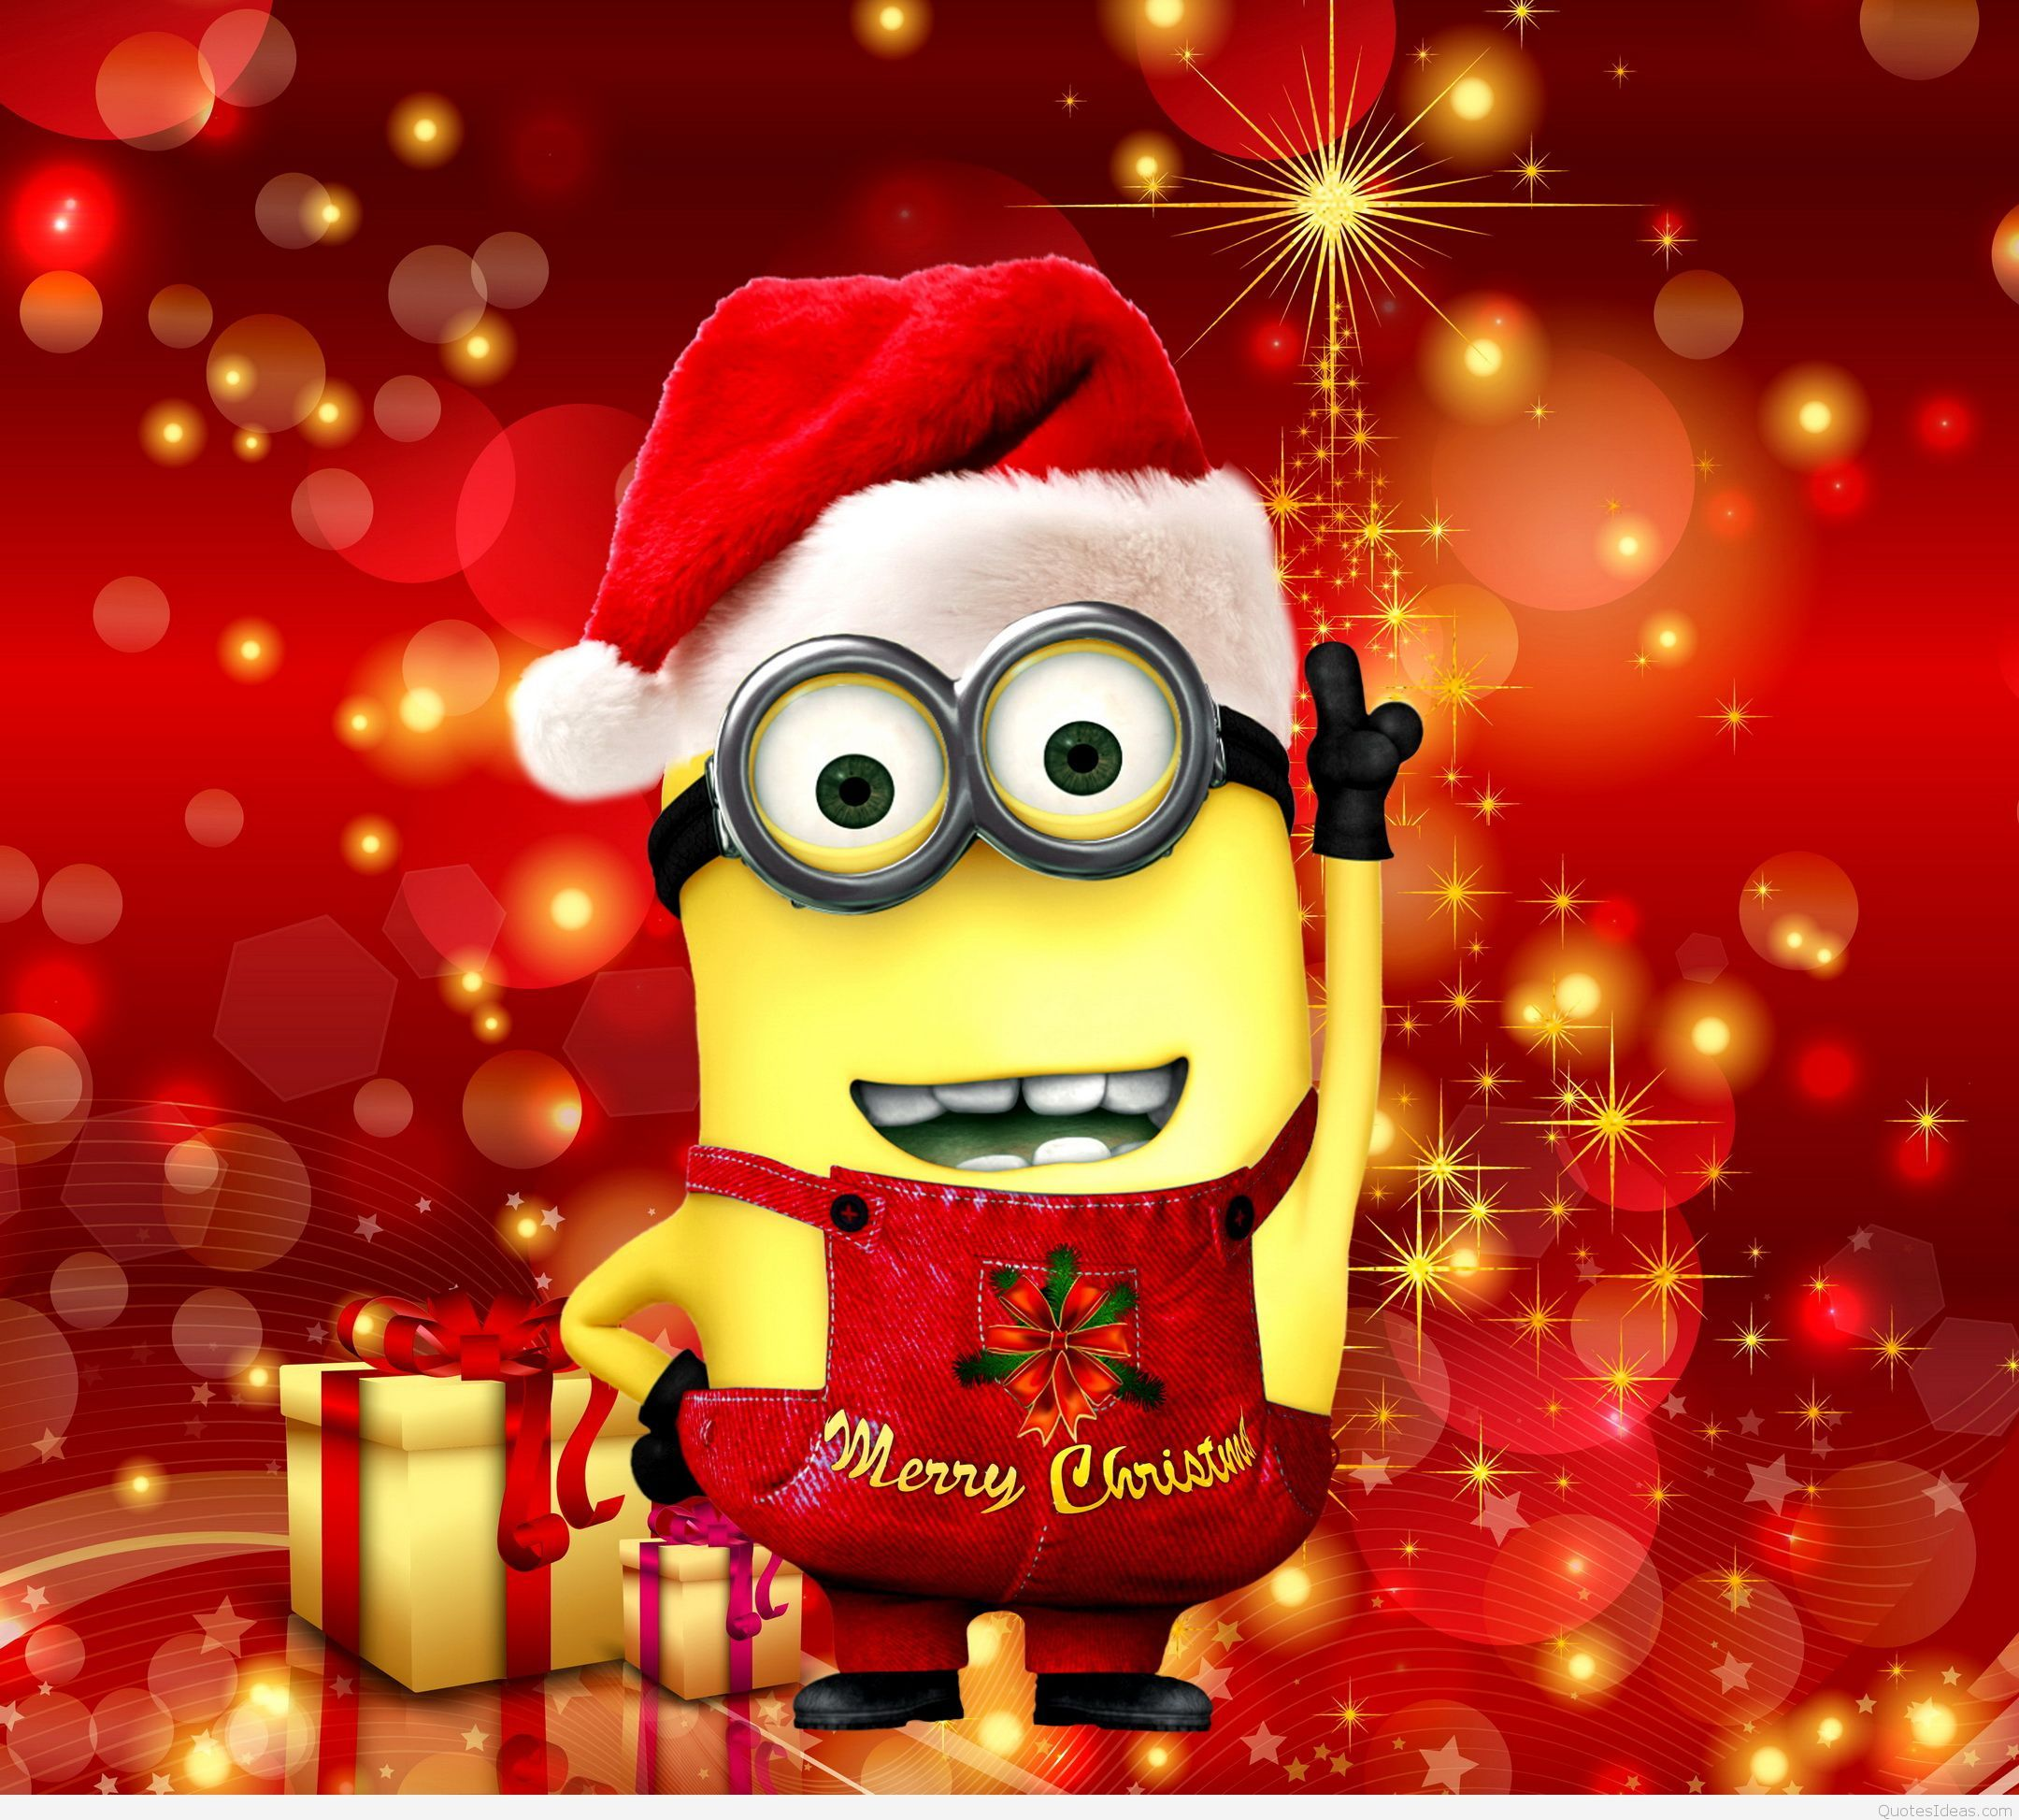 Merry Christmas Minion Wallpaper Minion Christmas Happy Merry Christmas Merry Christmas Minions